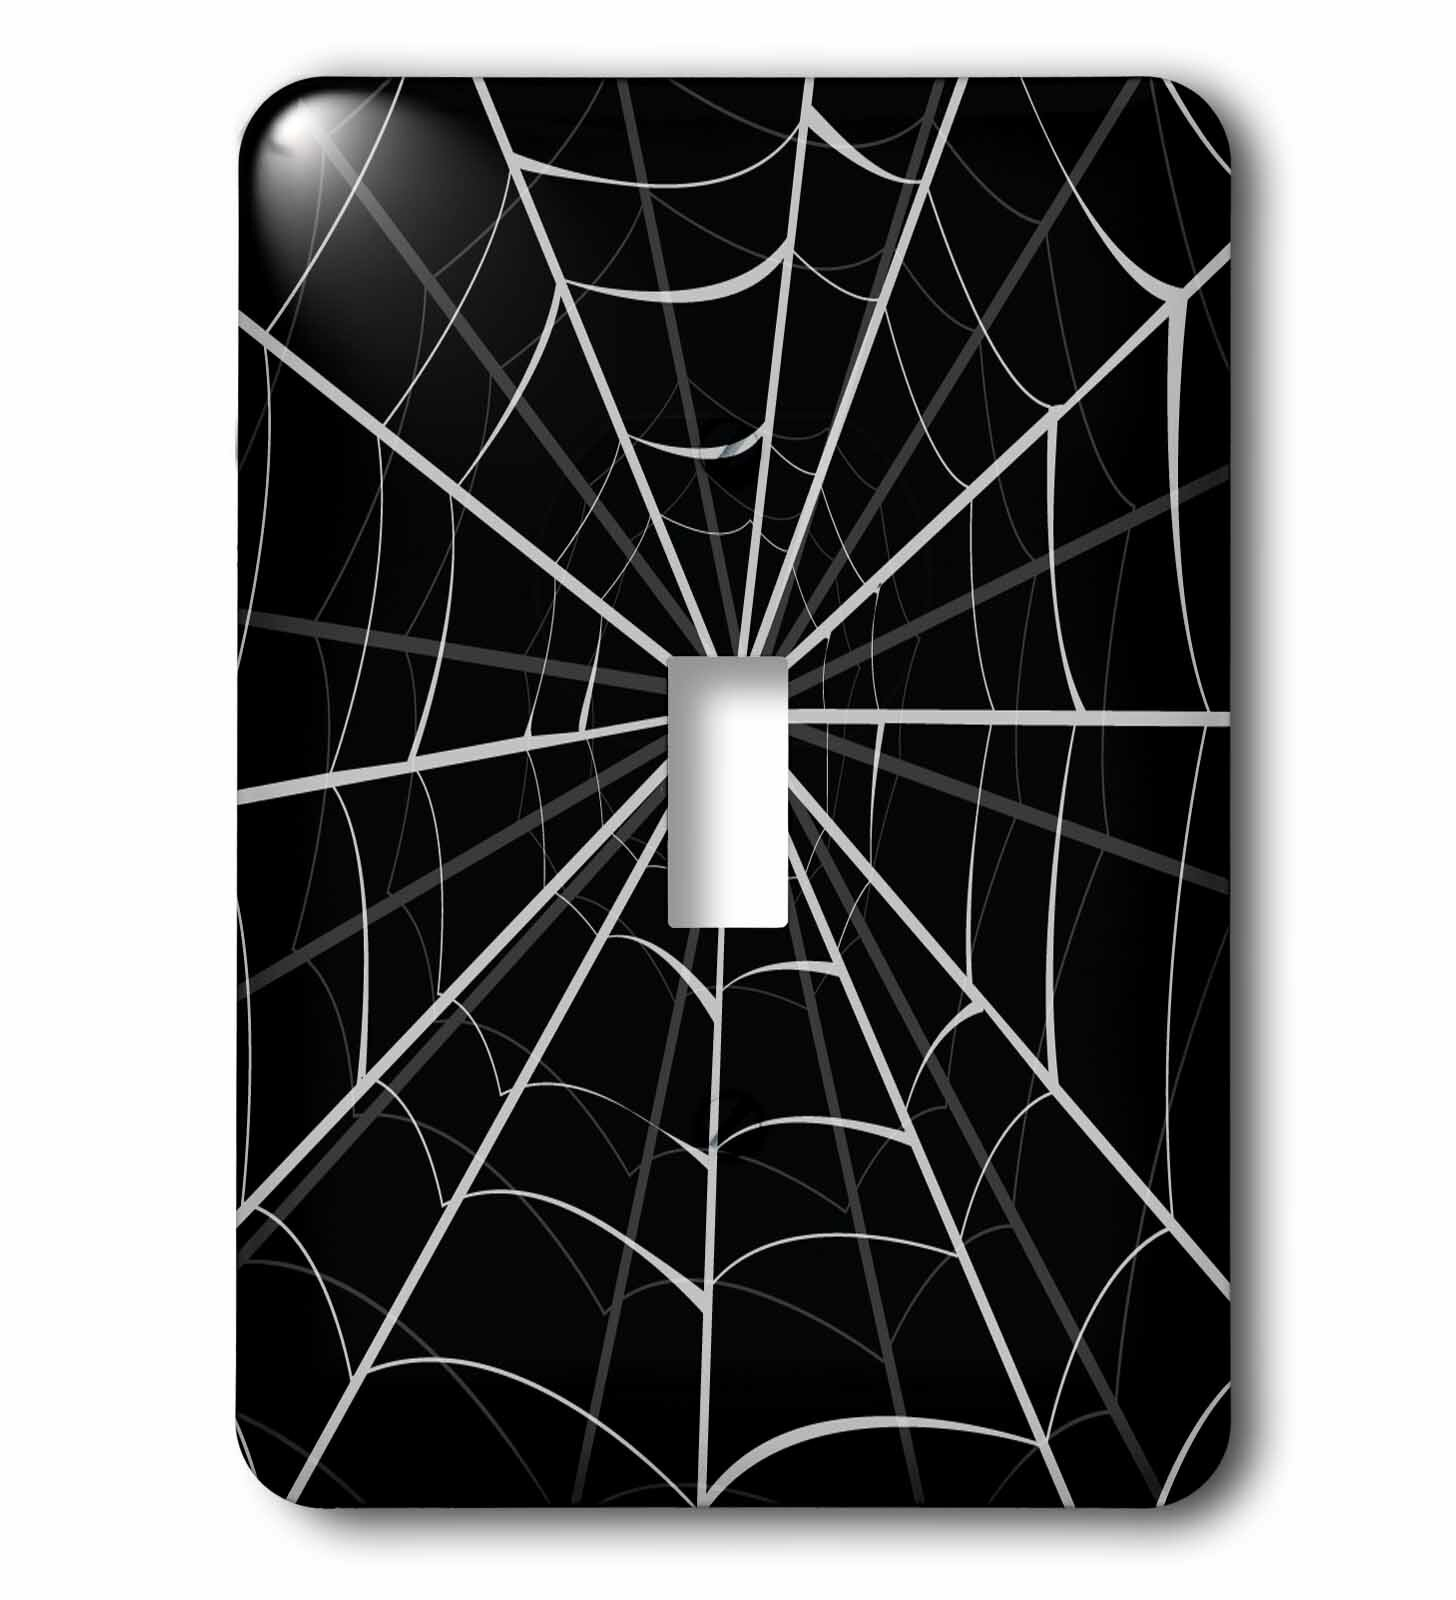 3drose A Big Spider Web Image 1 Gang Toggle Light Switch Wall Plate Wayfair